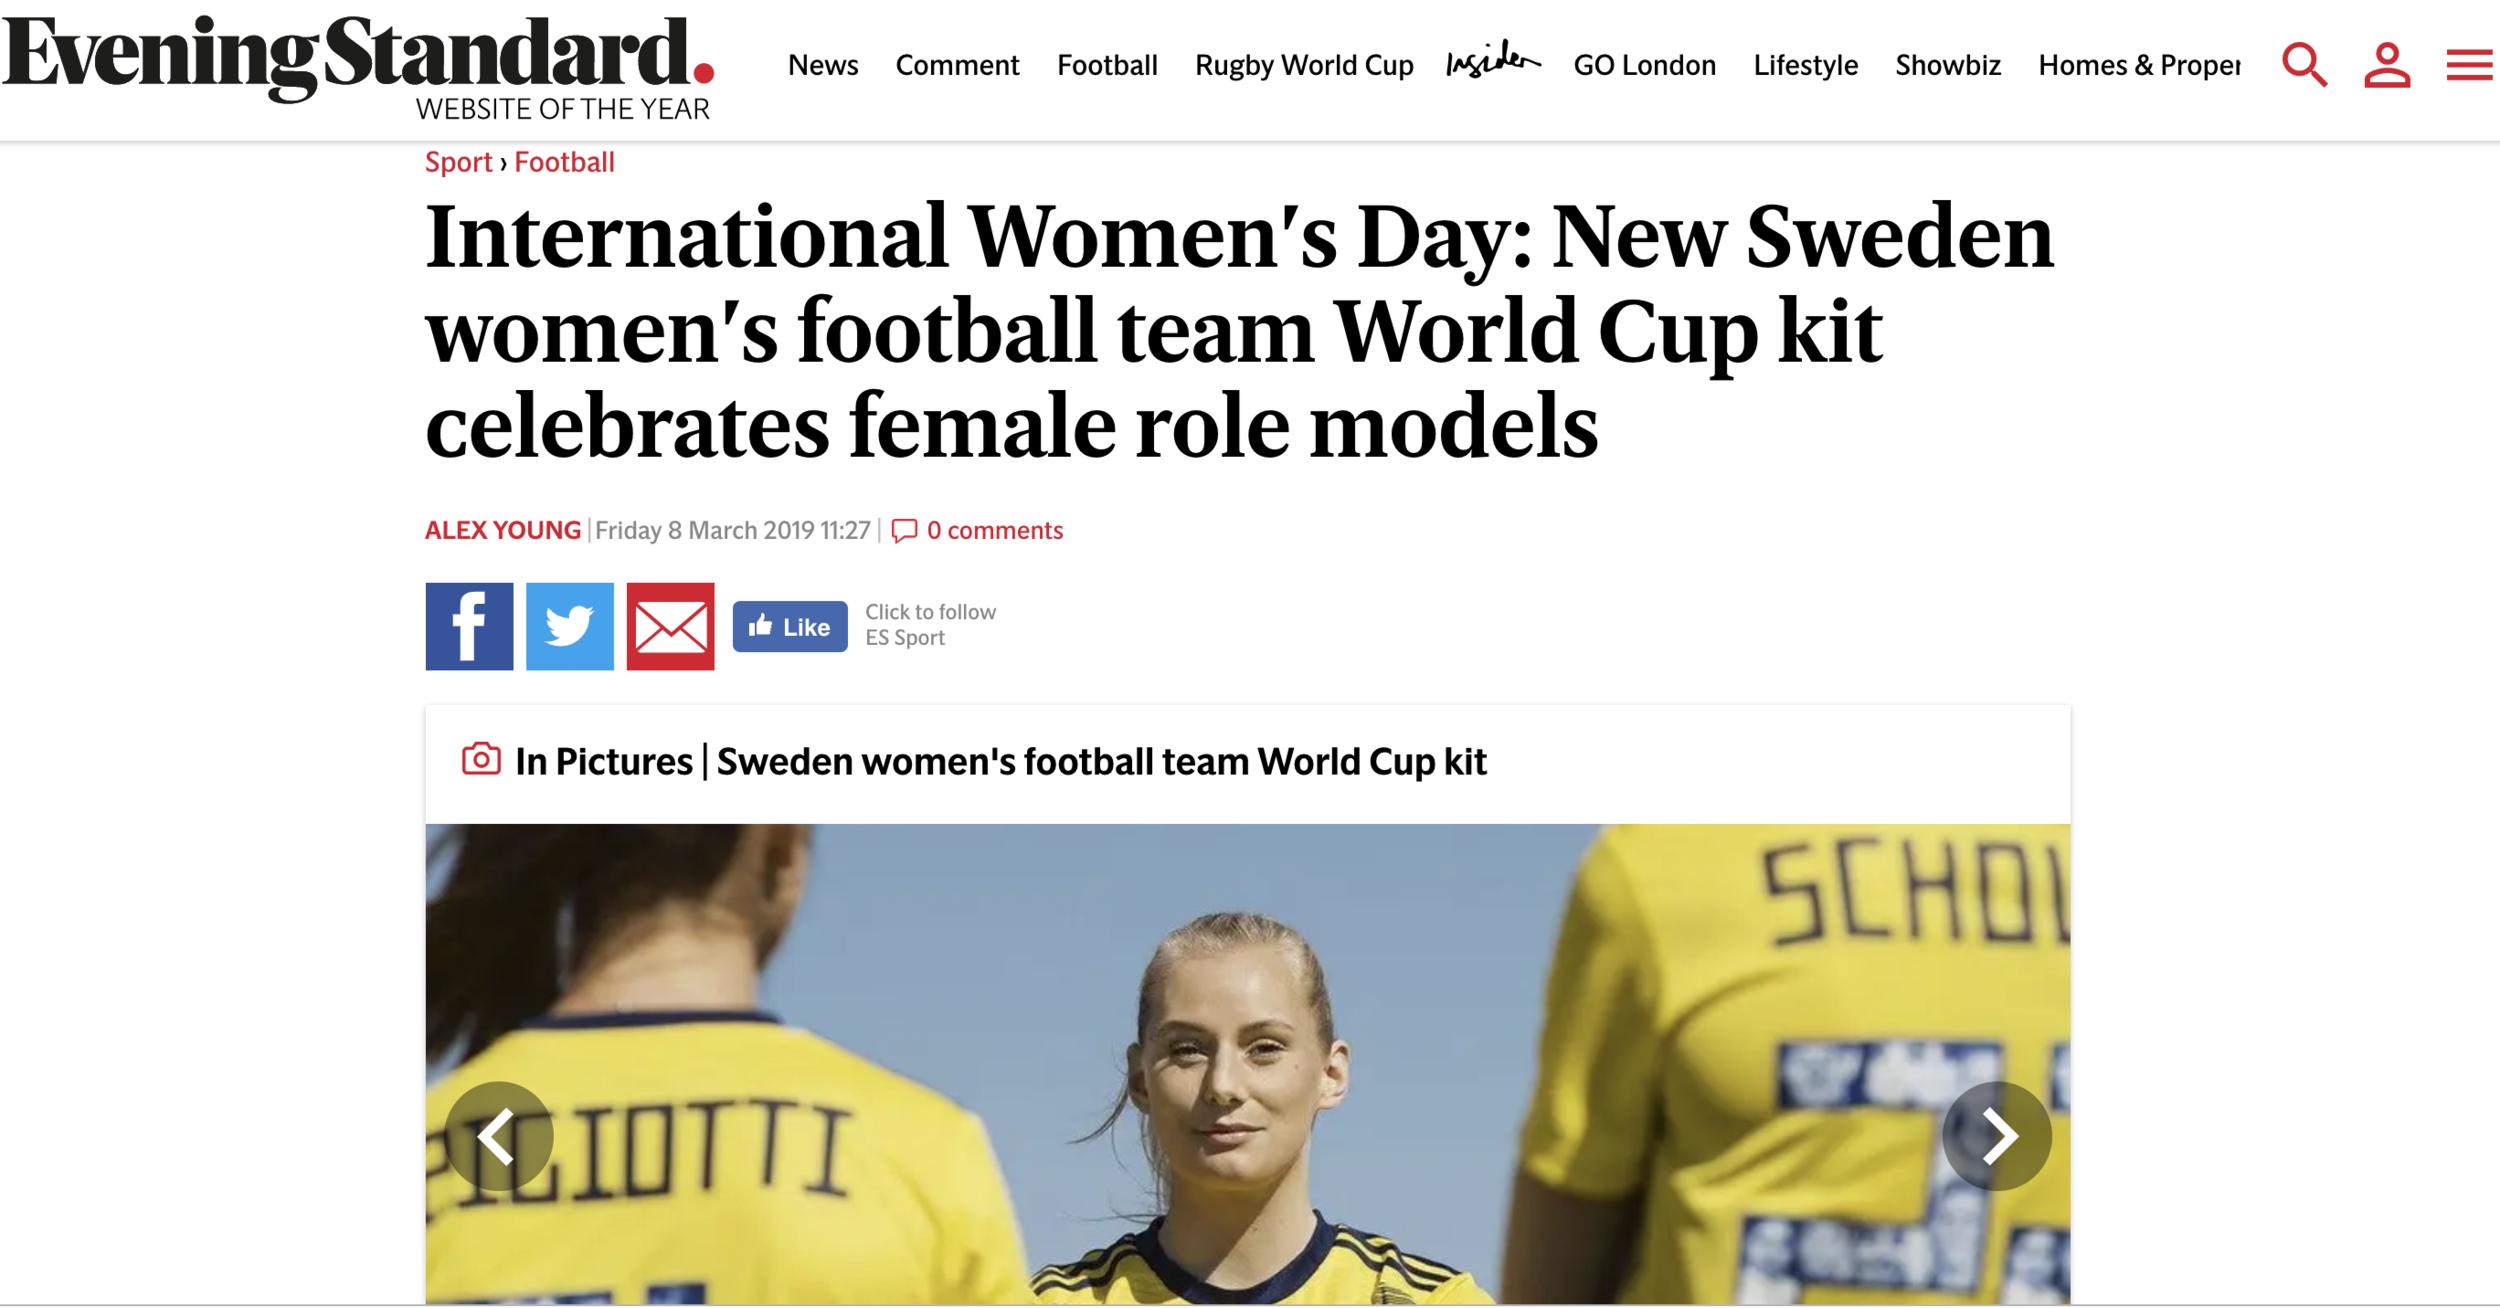 Evening Standard:  Sweden women's football team celebrates female role models